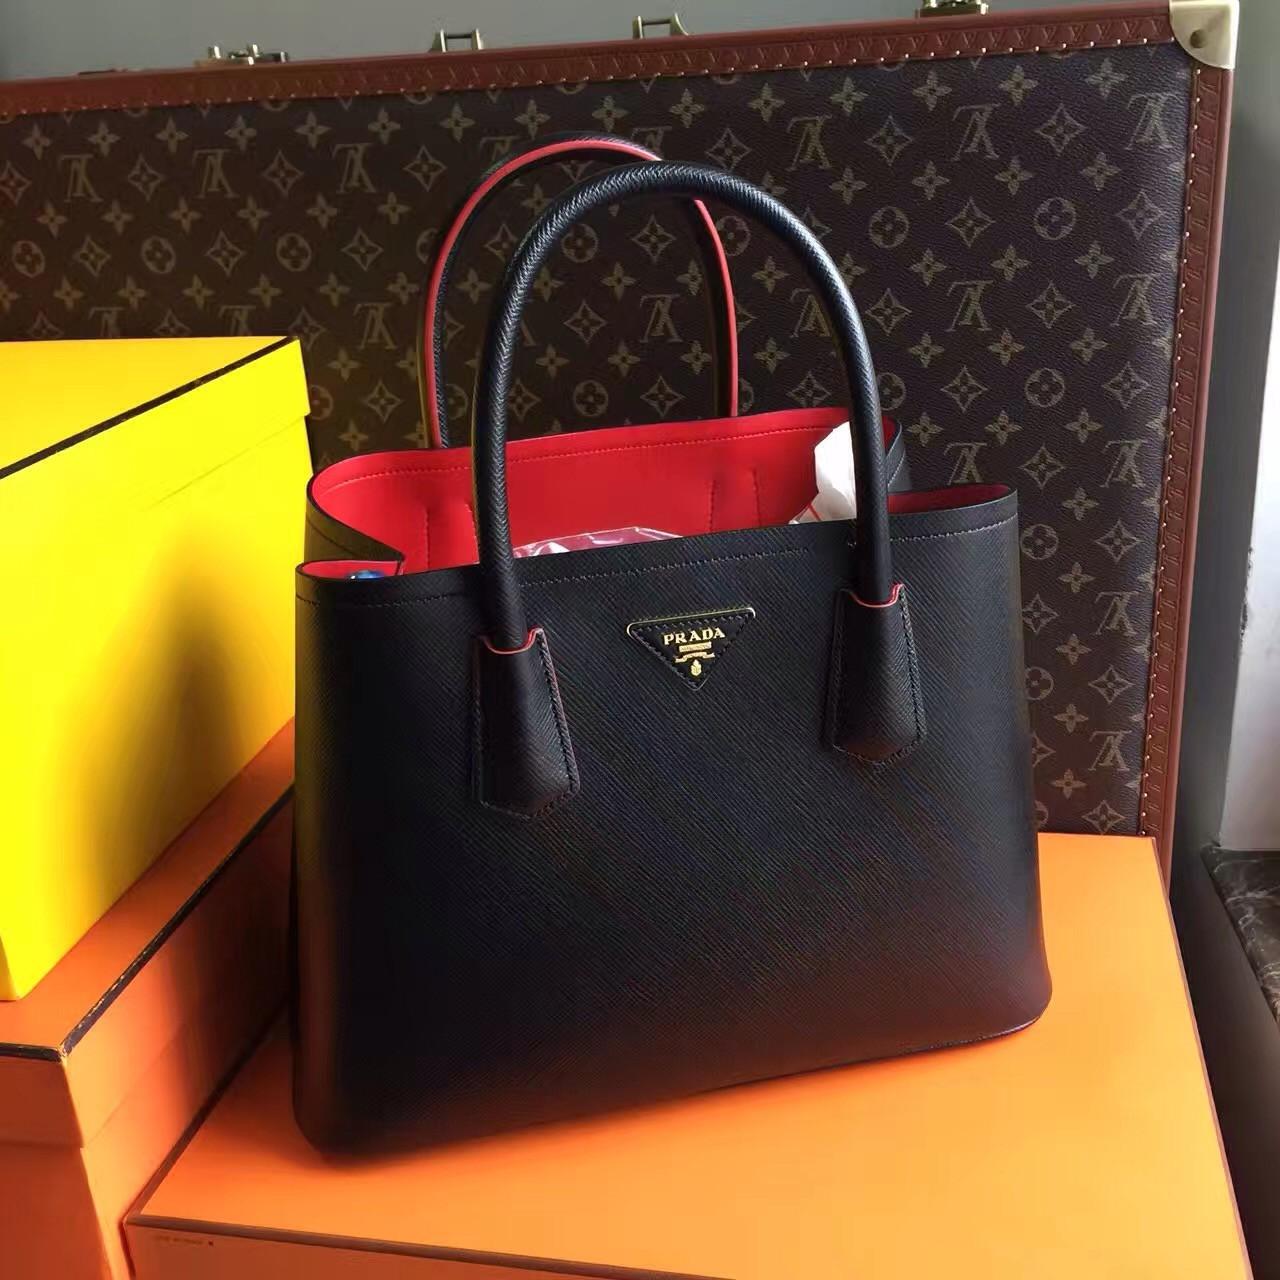 457427529e50 Final Sale]Prada double bag - Bella Vita Moda